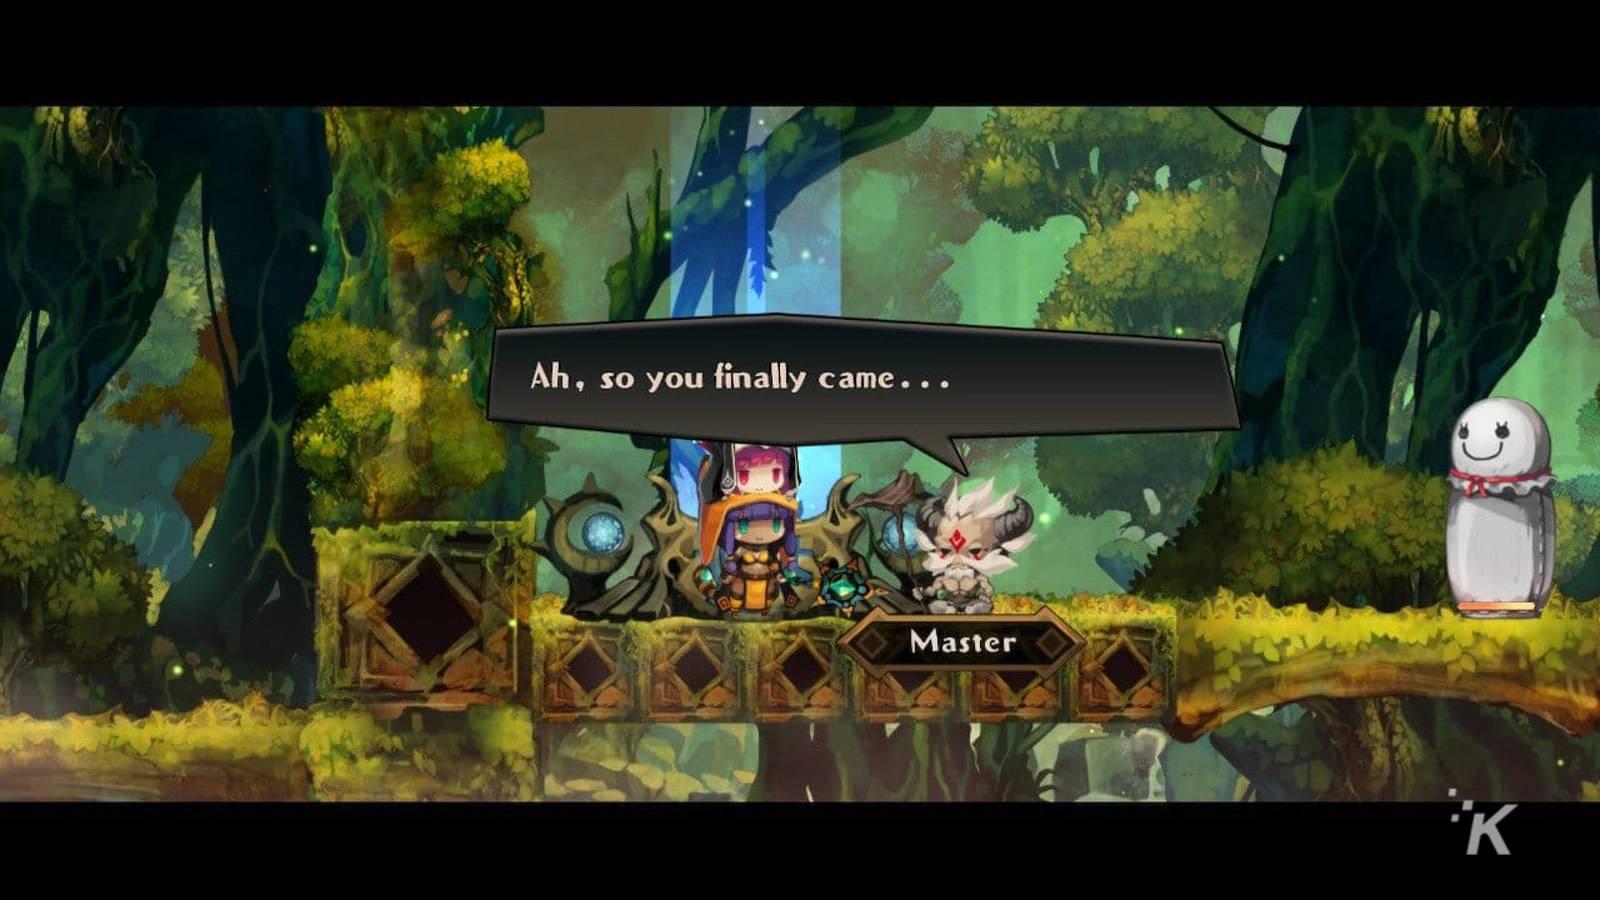 gameplay from lapis